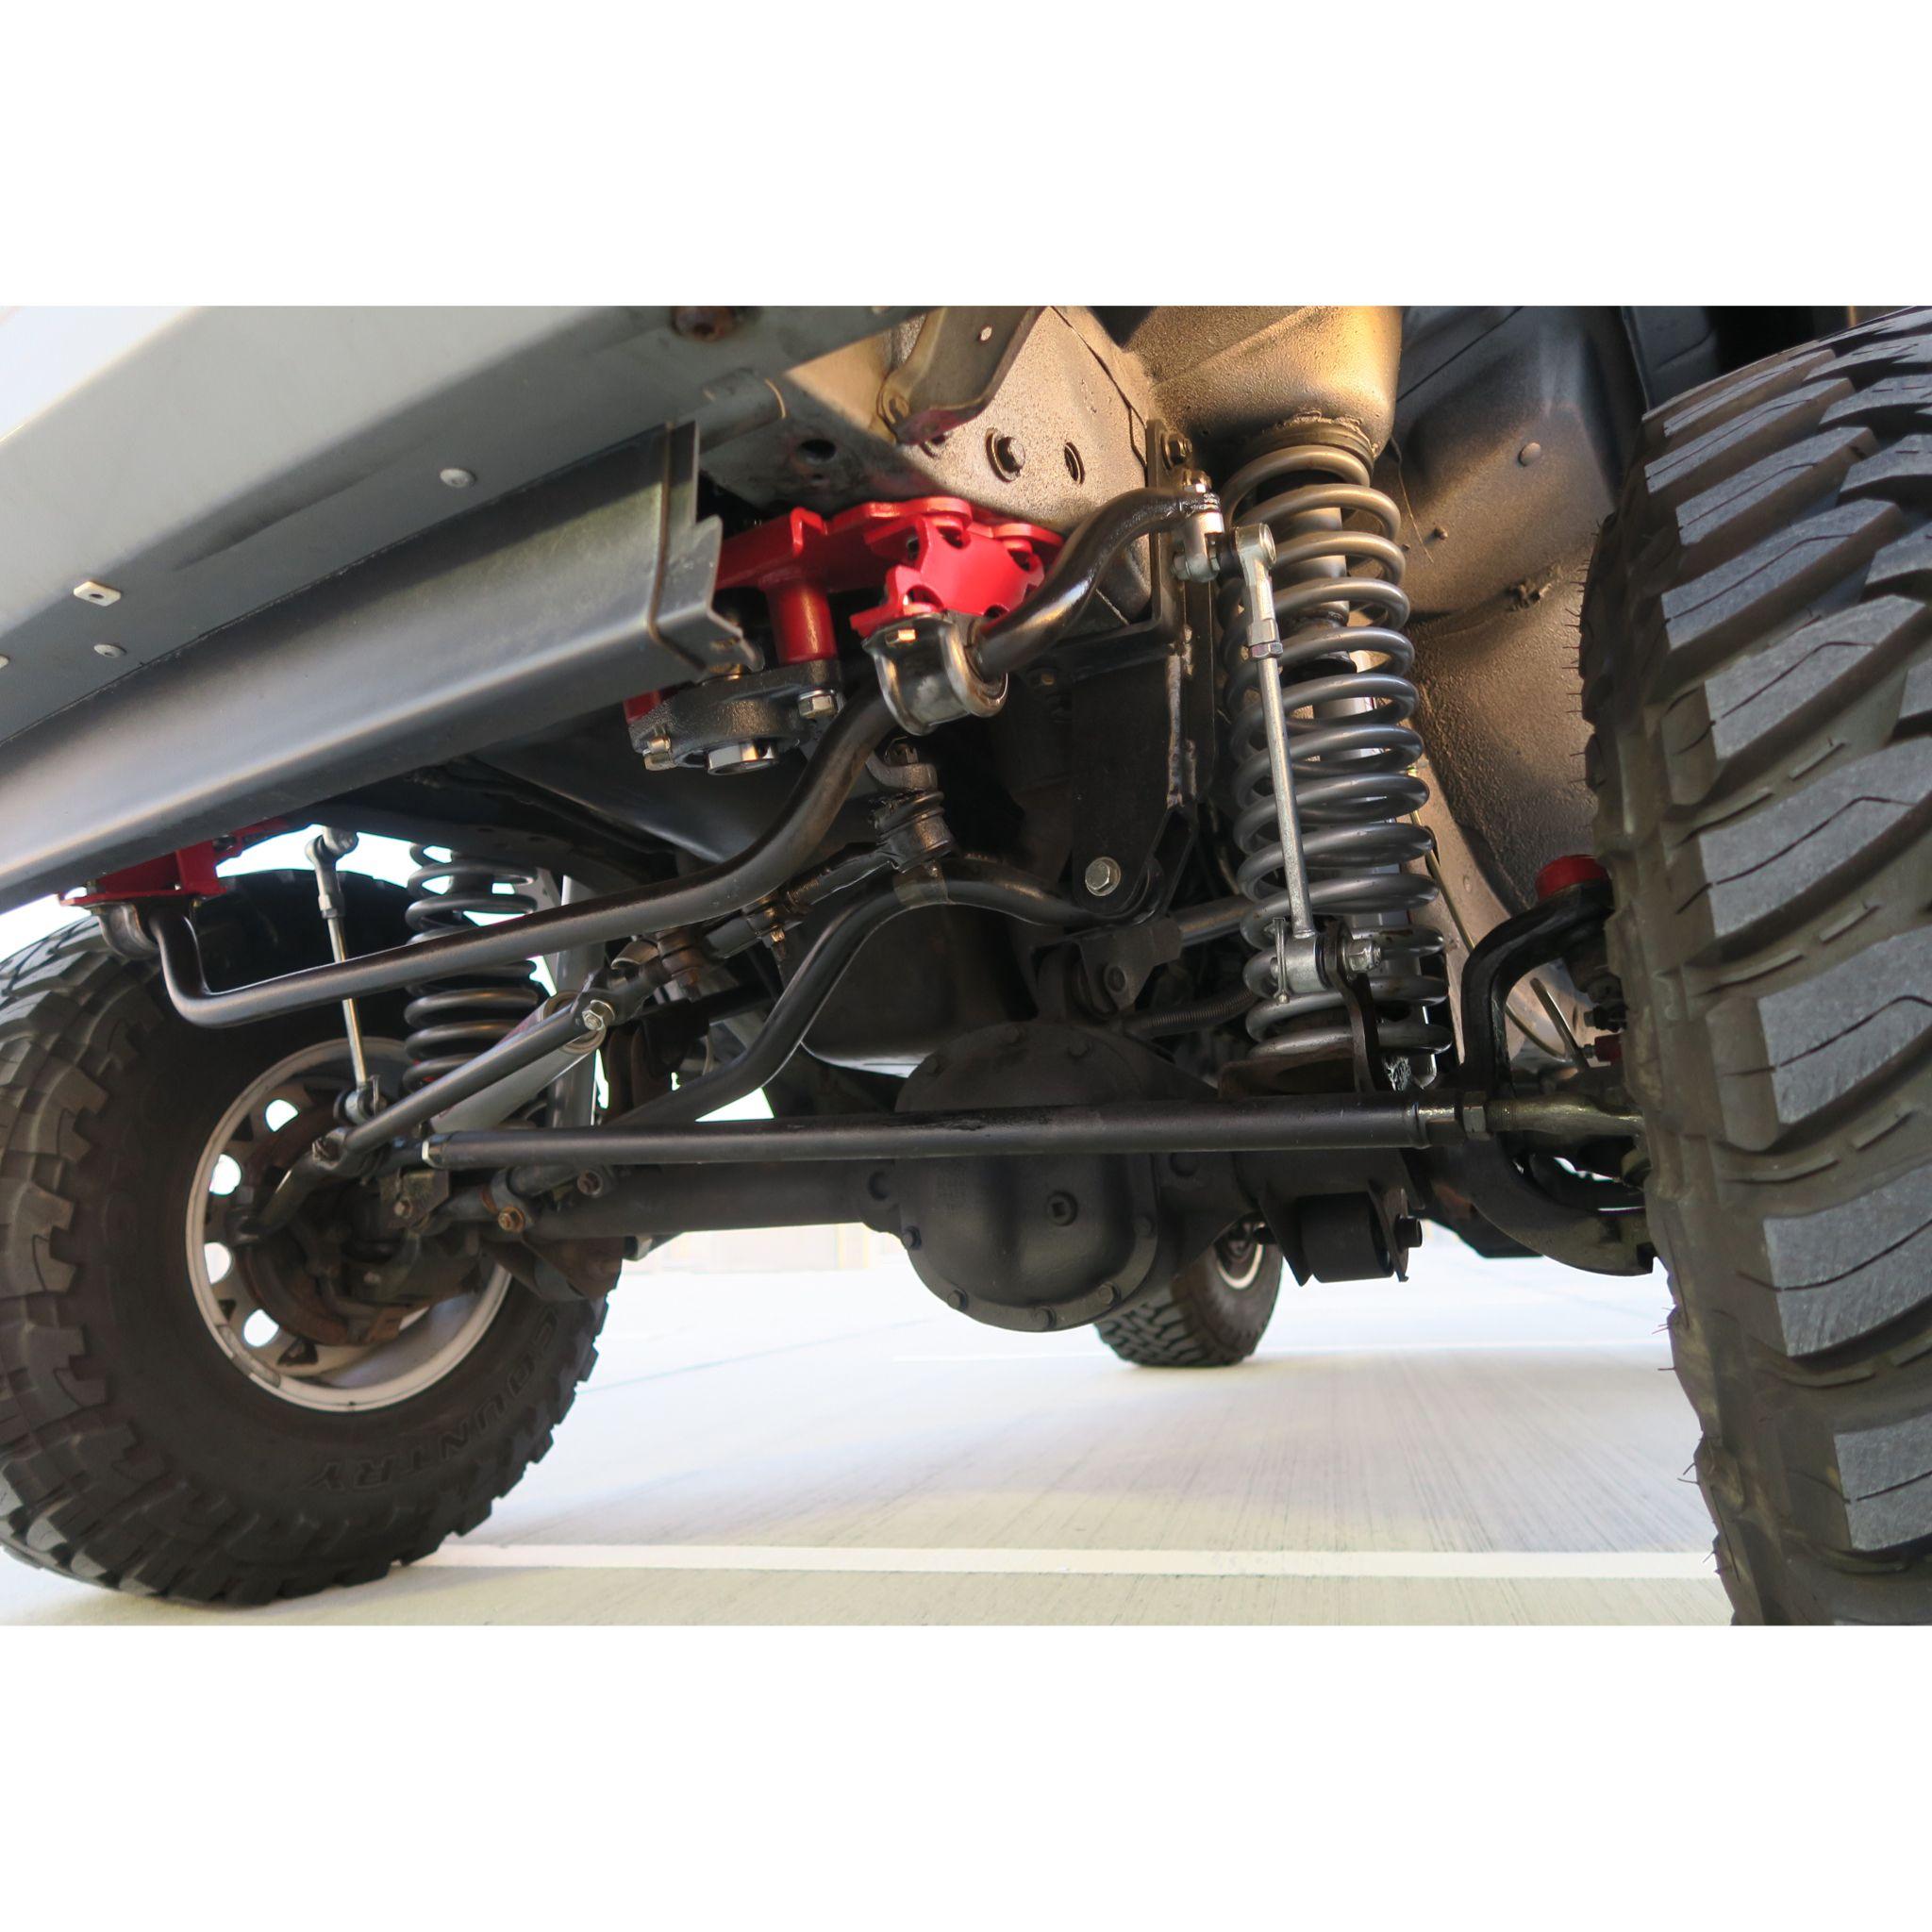 New Steering Brace For Jeep Cherokee Xj Jeep Xj Jeep Cherokee Jeep